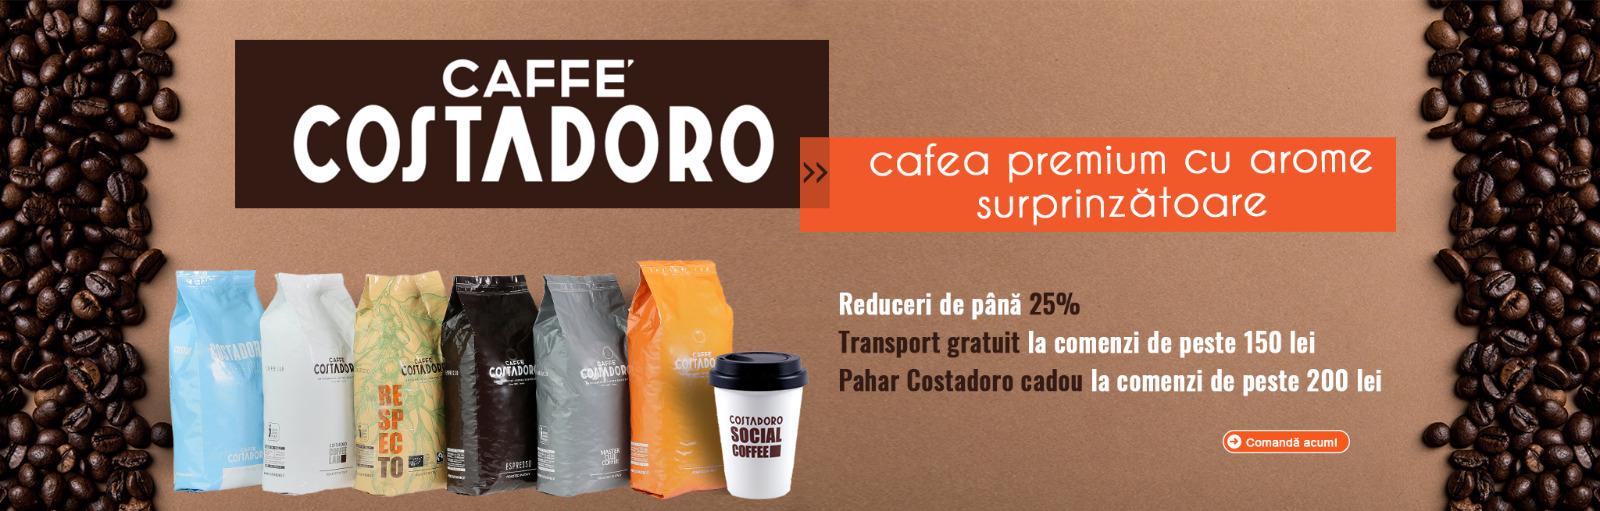 Promotii cafea Costadoro - pahar Costadoro cadou